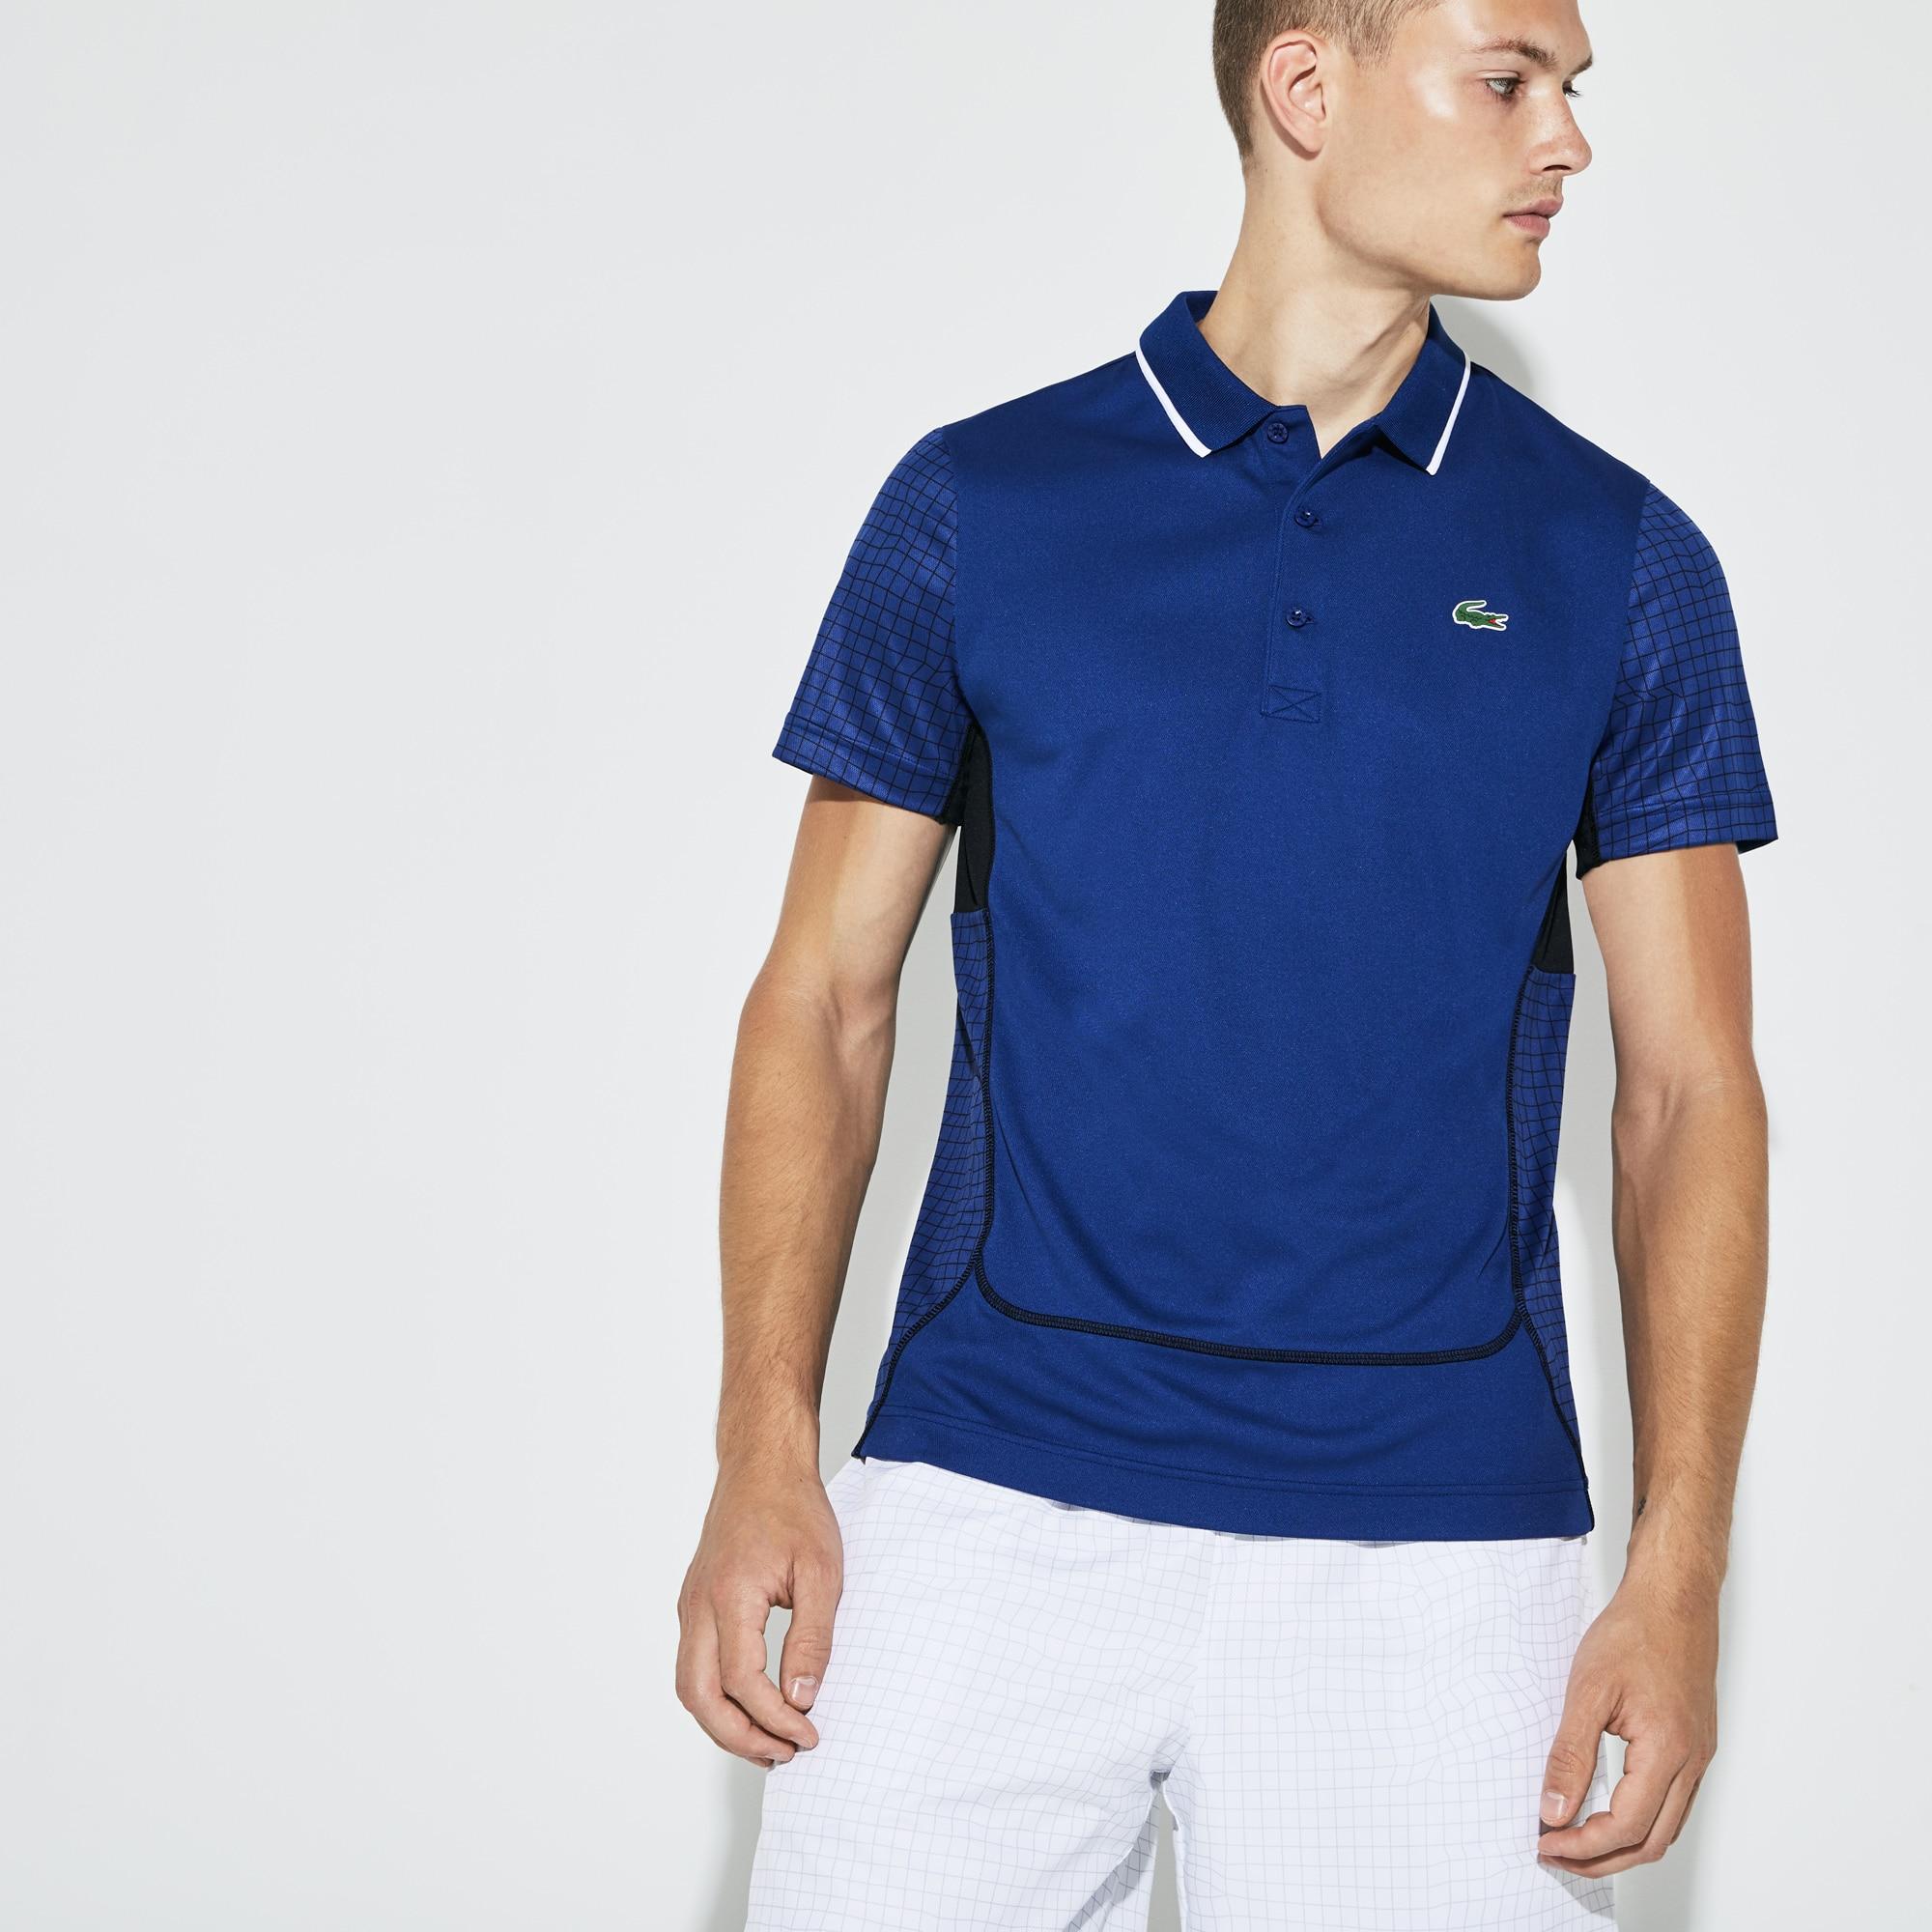 Men's SPORT Net Print Piqué Tennis Polo